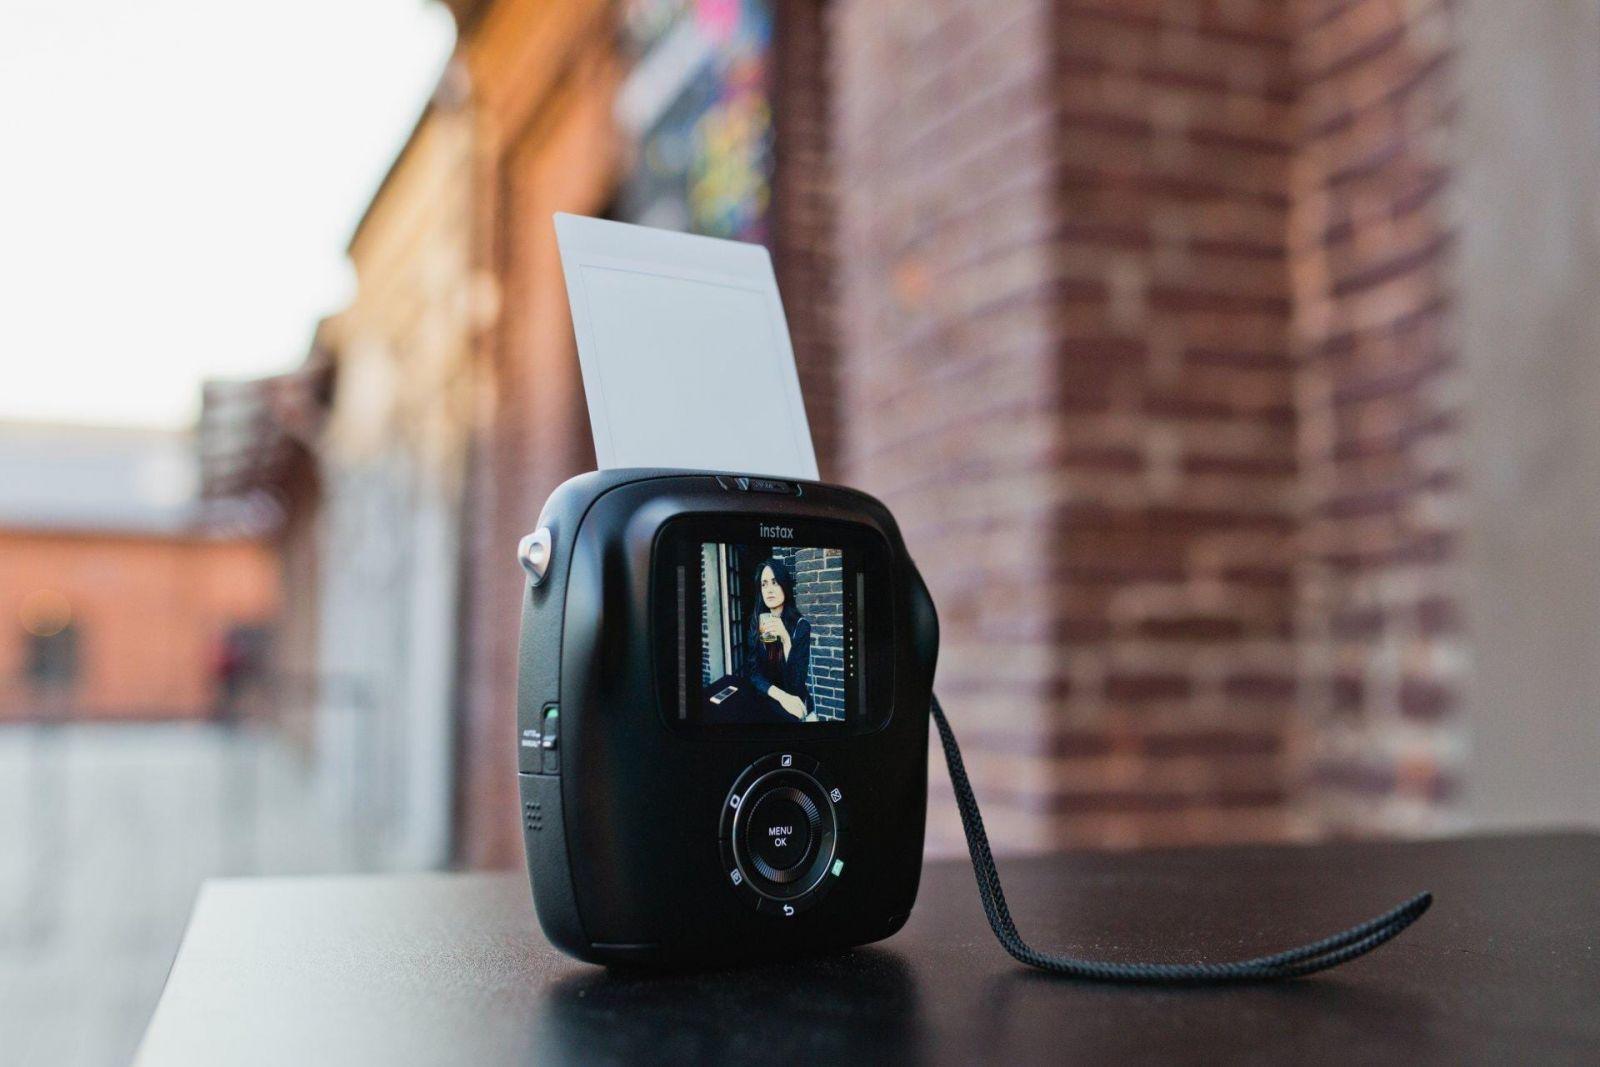 IMG 1181 - Fujifilm представила камеру Instax SQ10 в России